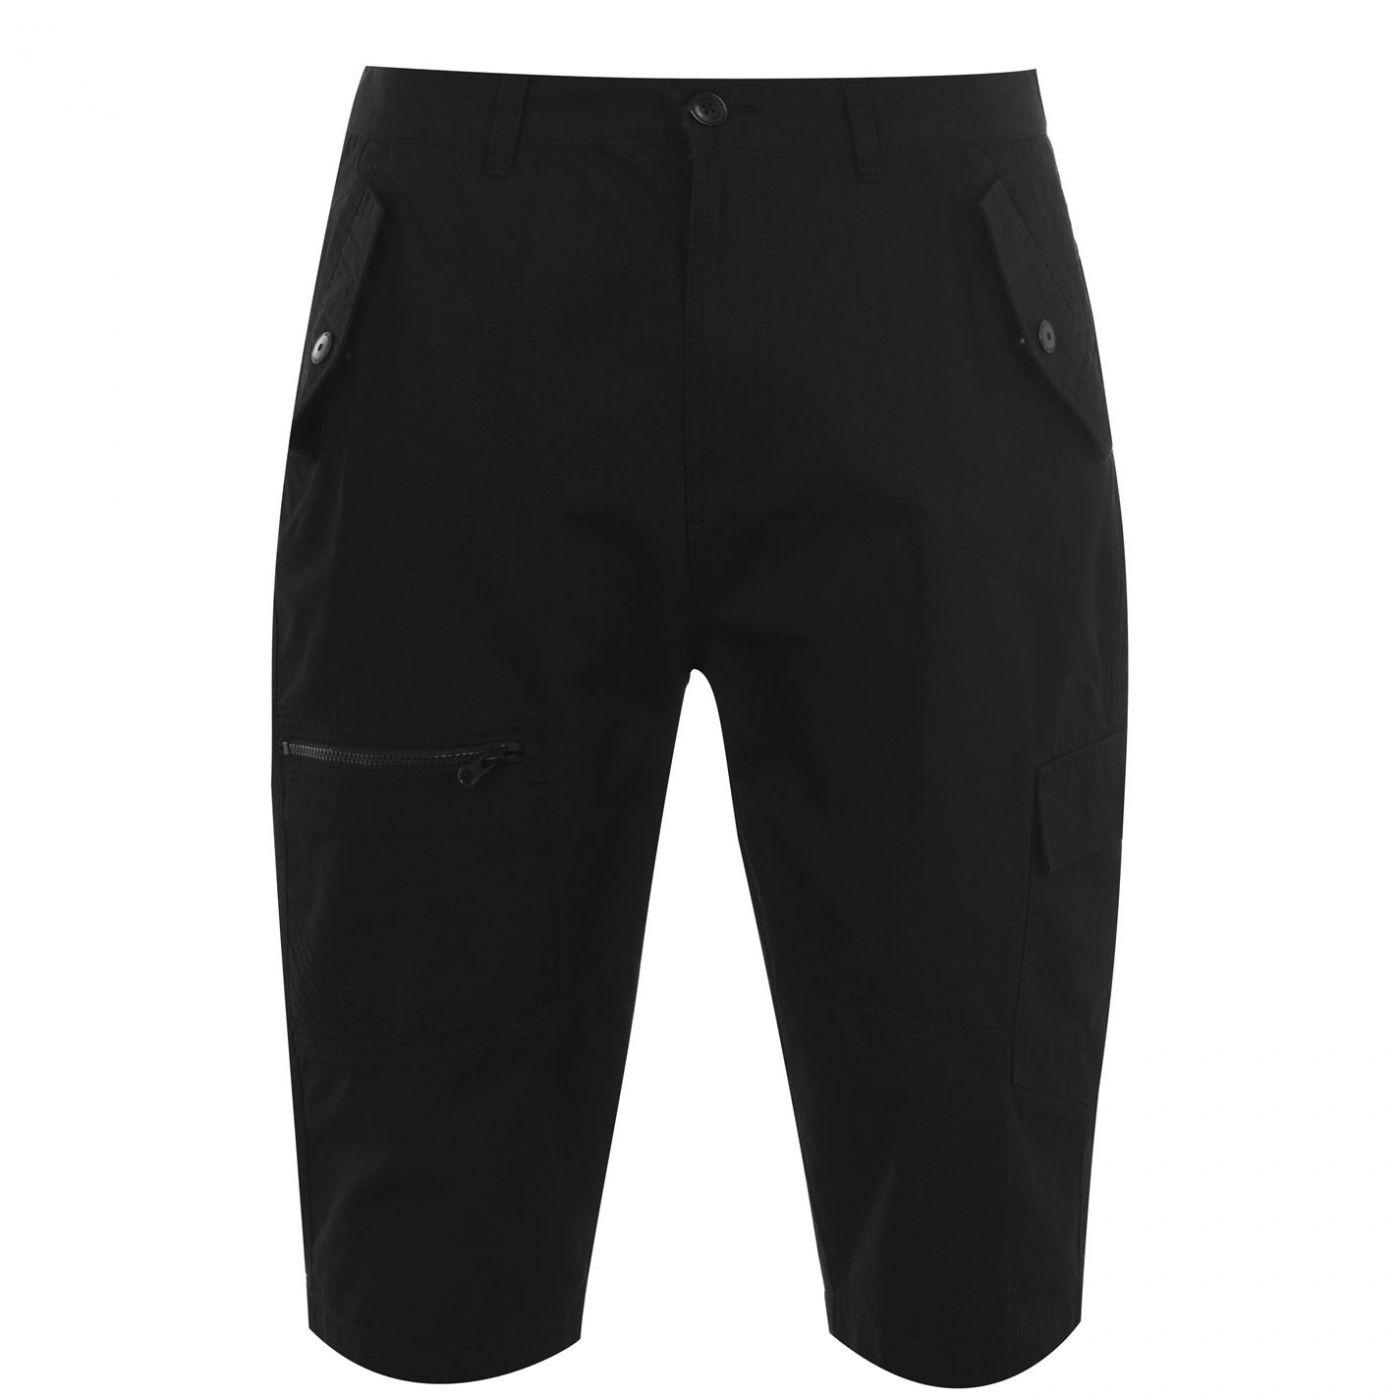 Pierre Cardin three quarter Cargo Shorts Mens